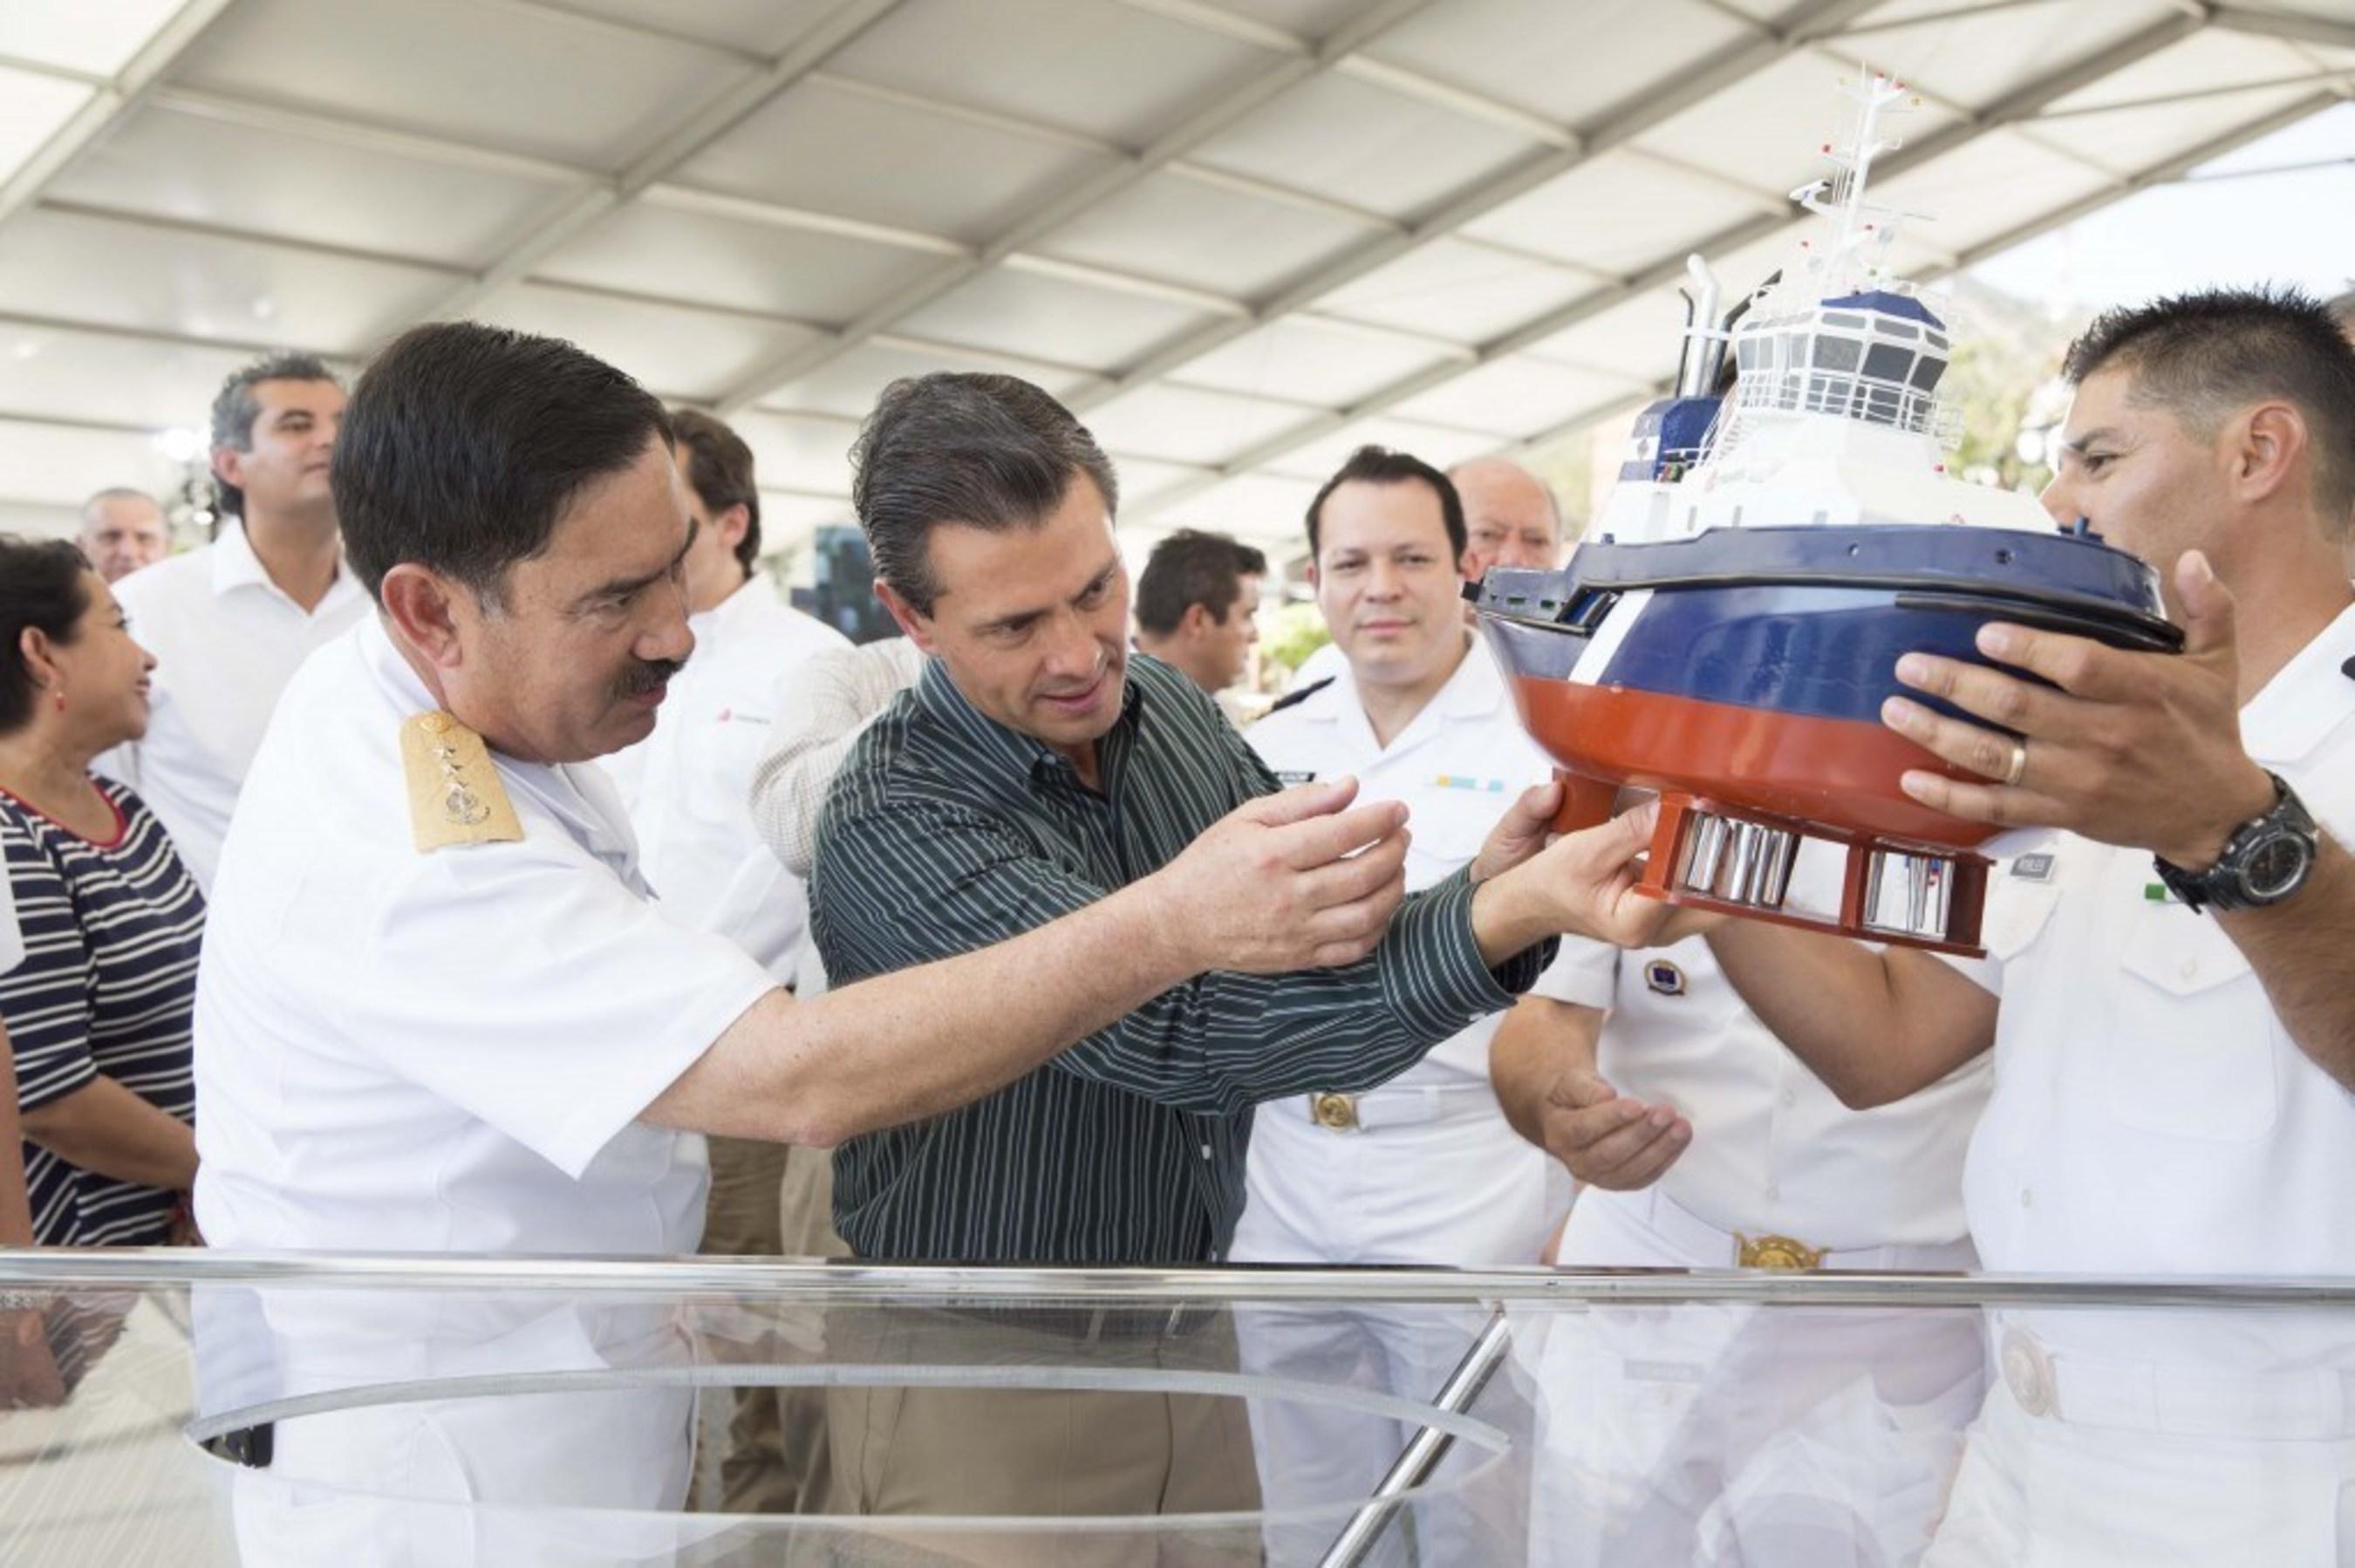 Mexico's President Enrique Pena Nieto commemorates start of